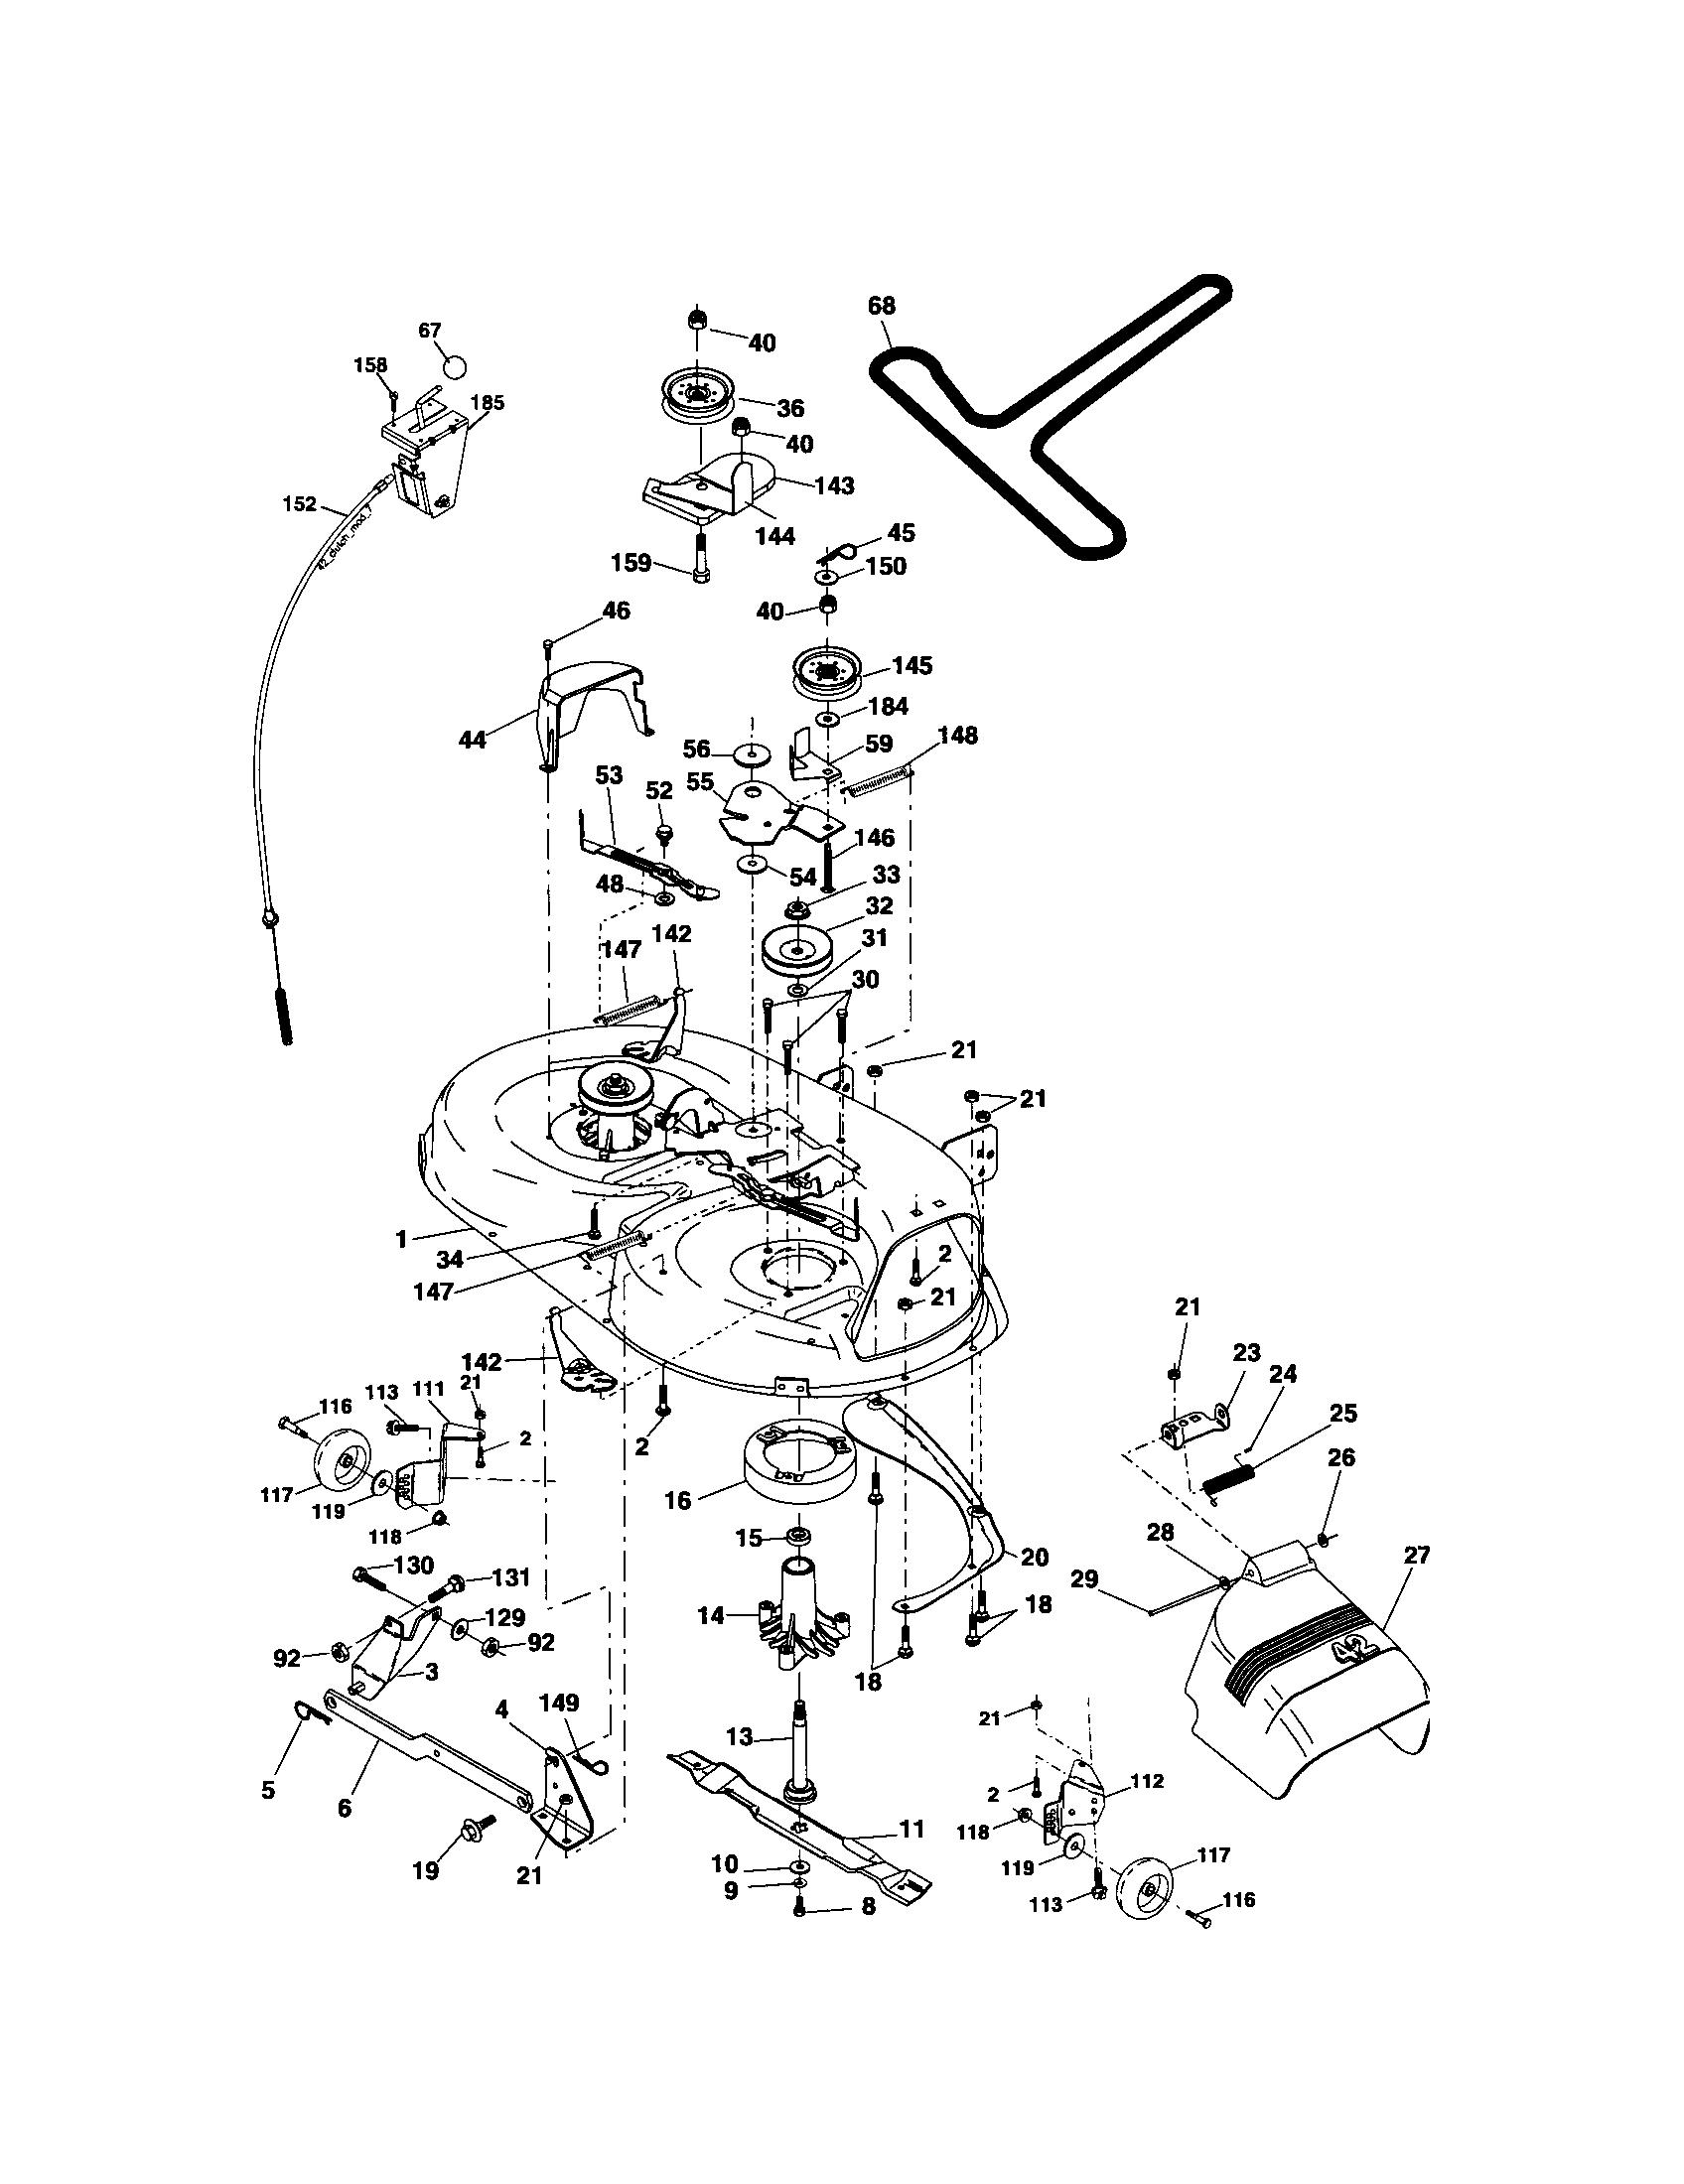 Mower Deck Diagram Amp Parts List For Model